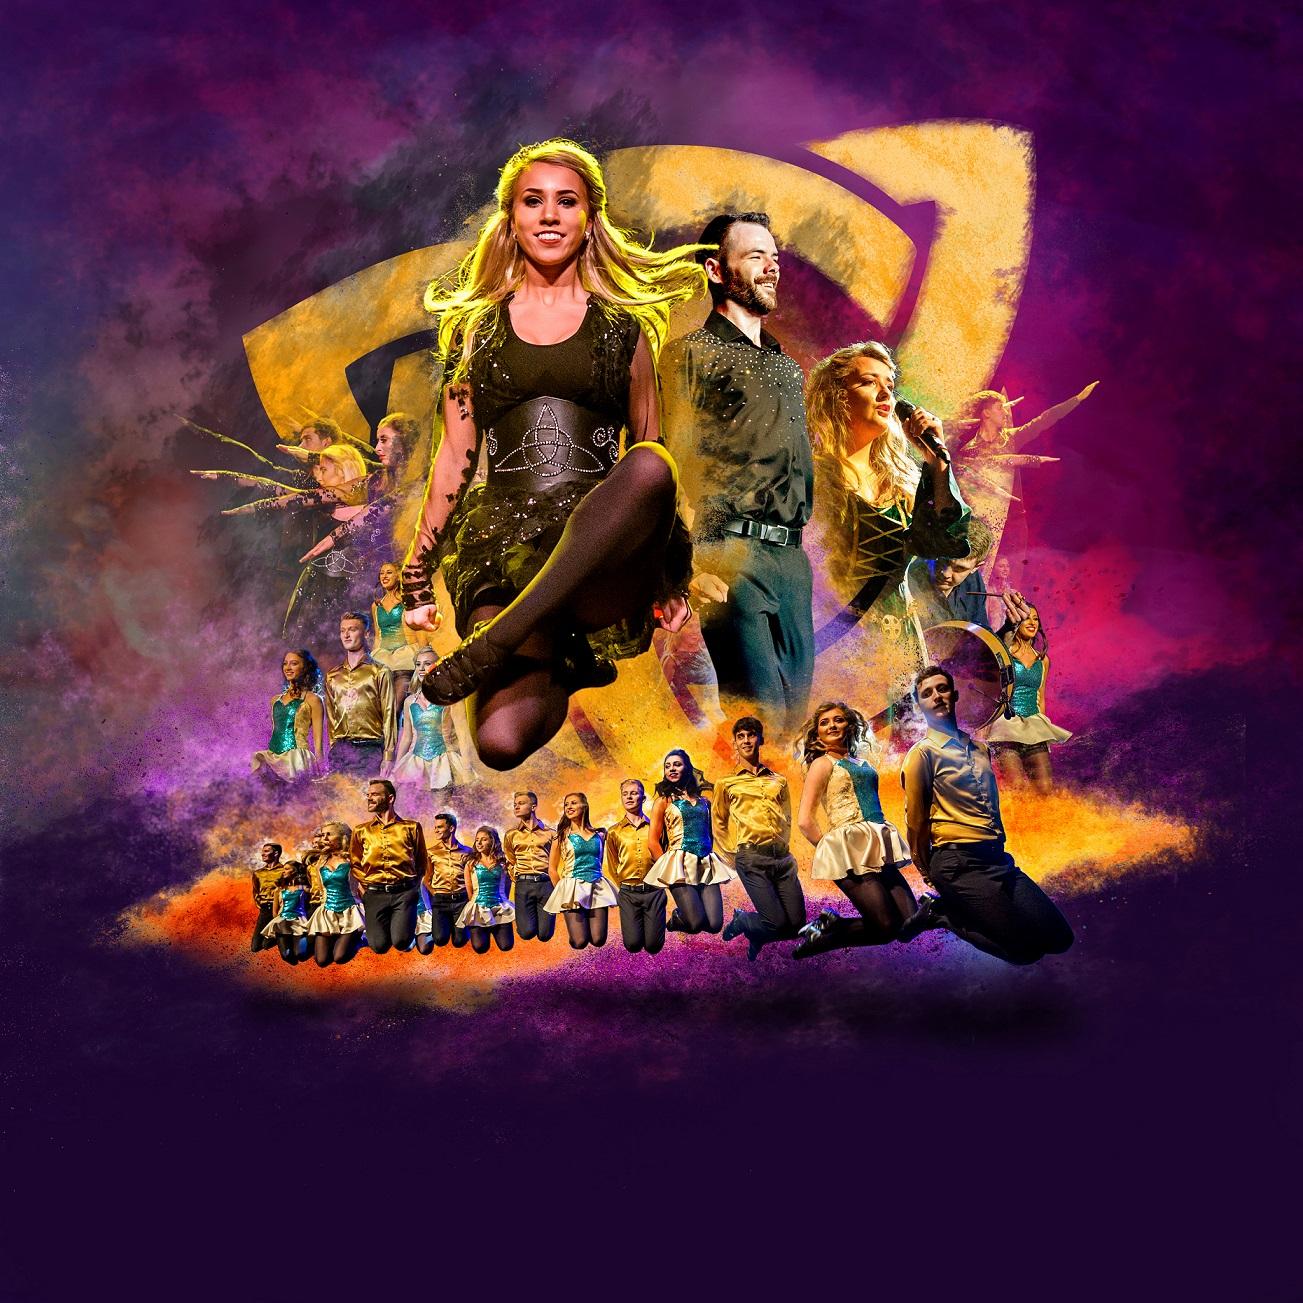 Rhythm of the dance + Voca people = Нереально крутое шоу